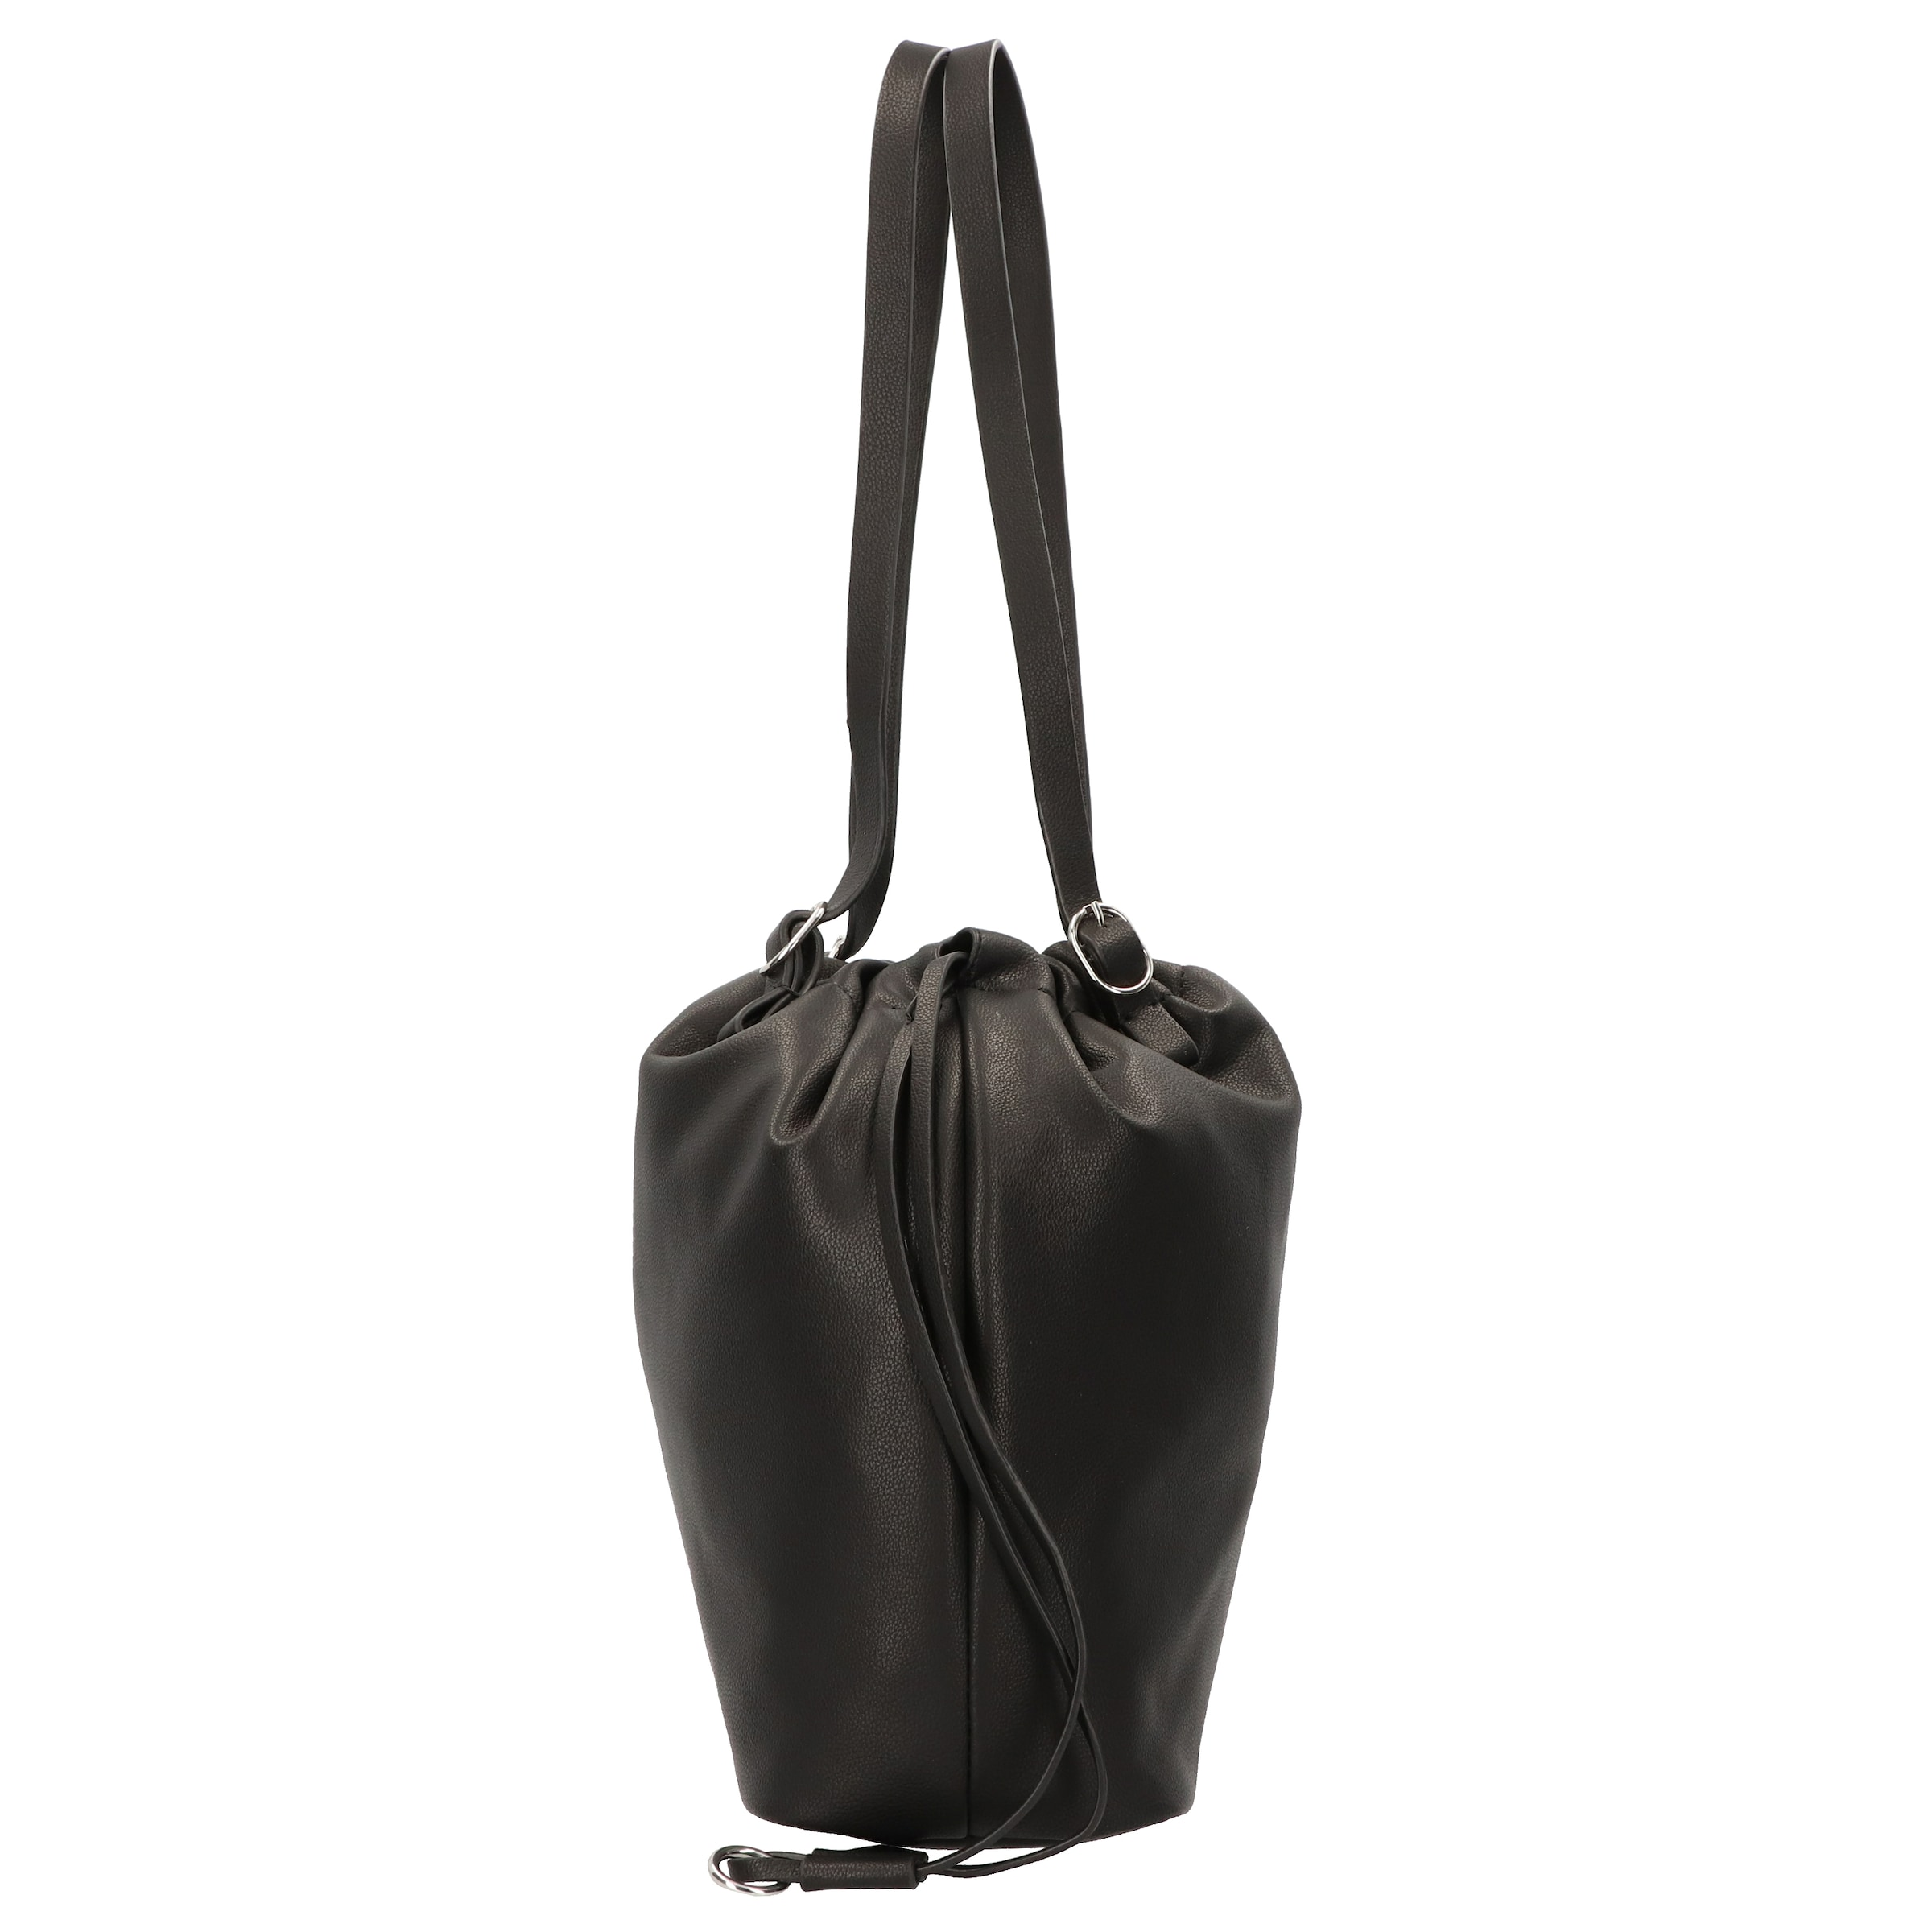 Cabas Cabas Cabas Noir Noir Esprit Esprit Cabas Esprit Noir En En Esprit En En TclKJF13